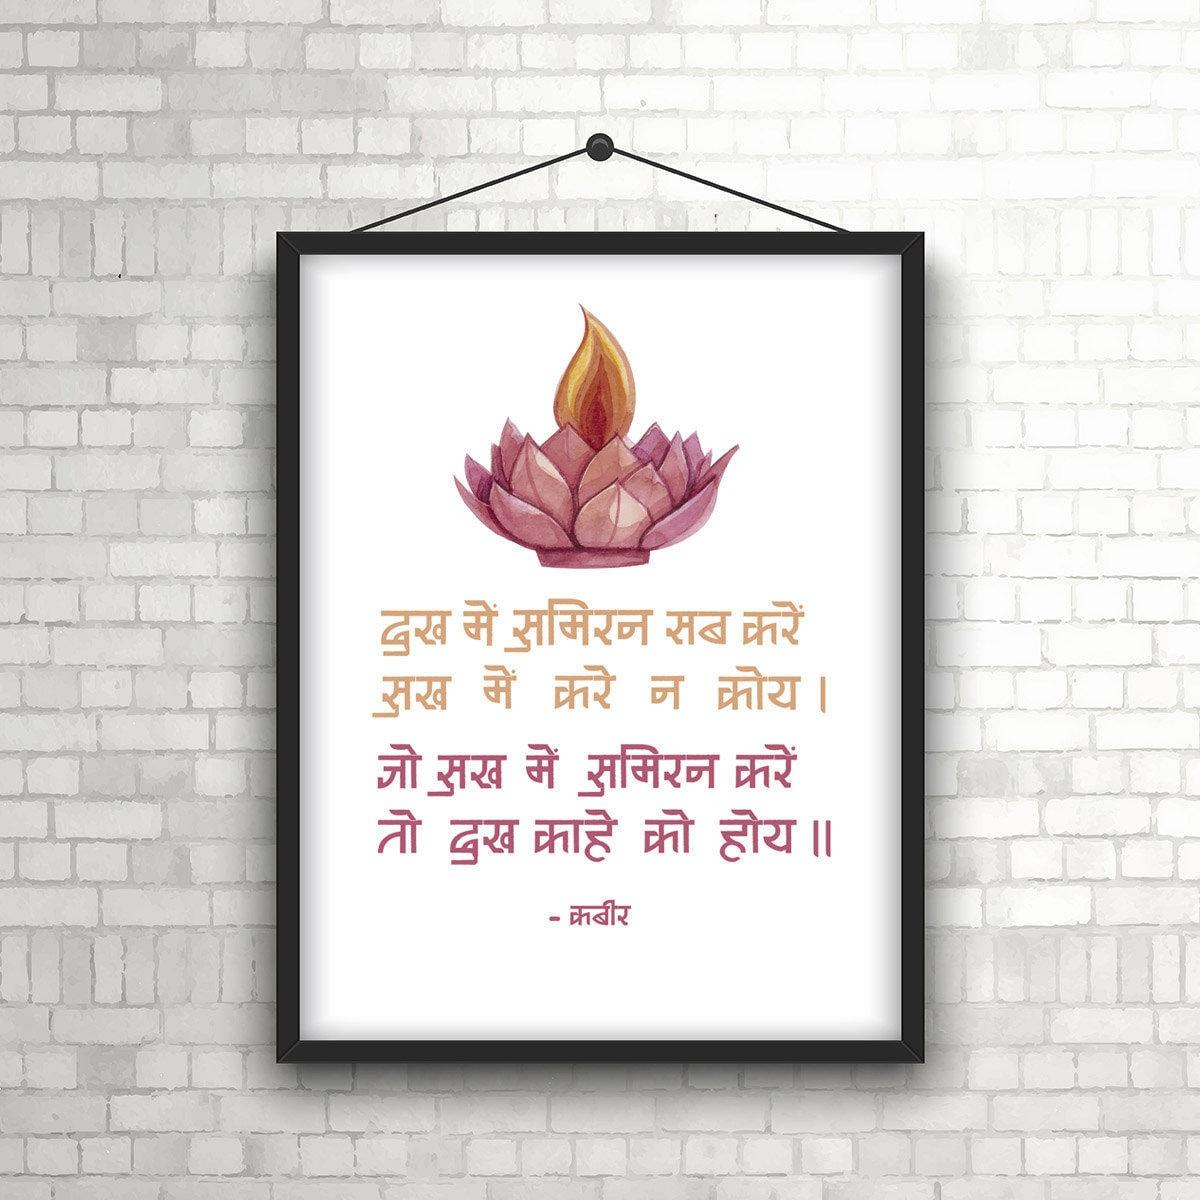 Kabir Dohe / Dichter Kabir Art / Kabir Ke Dohe Rahmen Kunst / Kabirdas Dohe  Art / Kabir Das Hindi Dohe / Kabir Dohe Typografie / indische Typografie ...